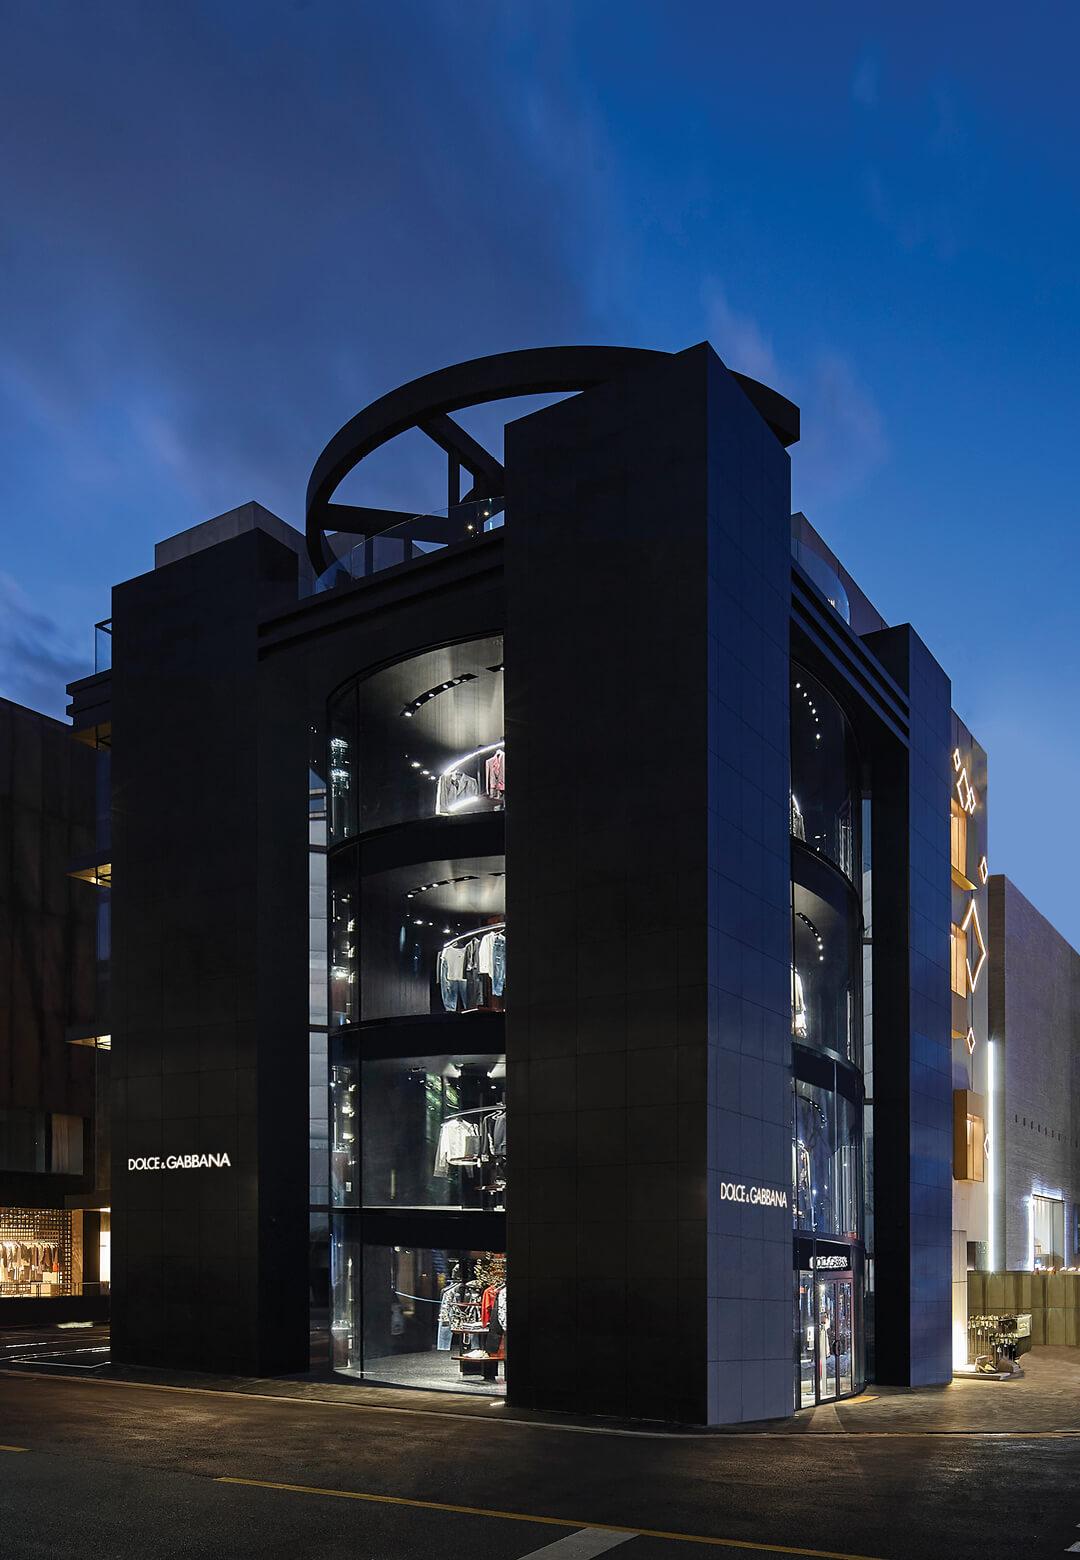 Dolce&Gabbana's new flagship store by Jean Nouvel; the store displaying the new Dolce&Gabbana Collection | Dolce & Gabbana flagship store, Seoul | Ateliers Jean Nouvel | STIRworld